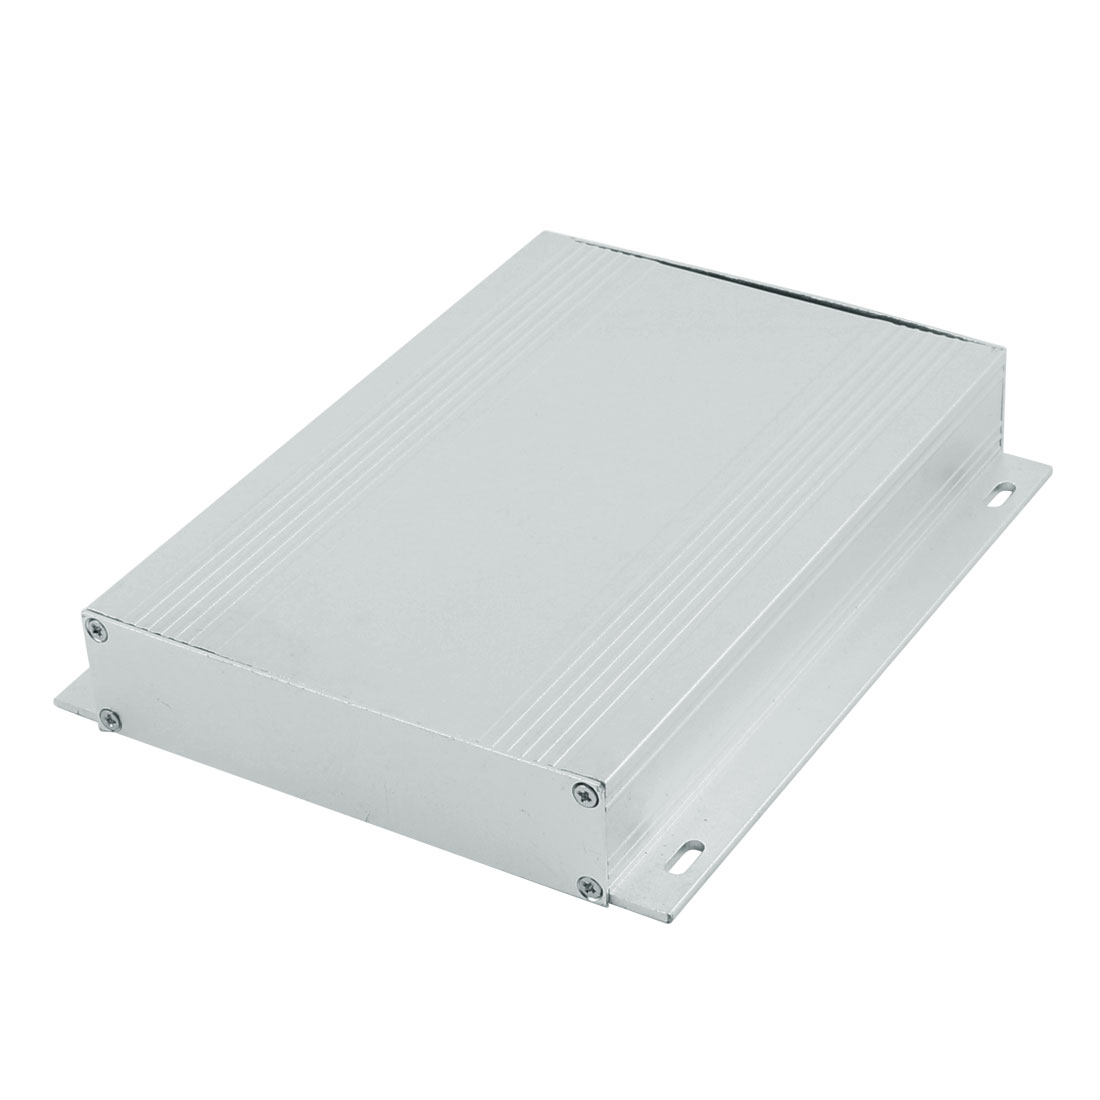 26 x 133 x 60mm Multi-purpose Electronic Extruded Aluminum Enclosure Case Silver Tone